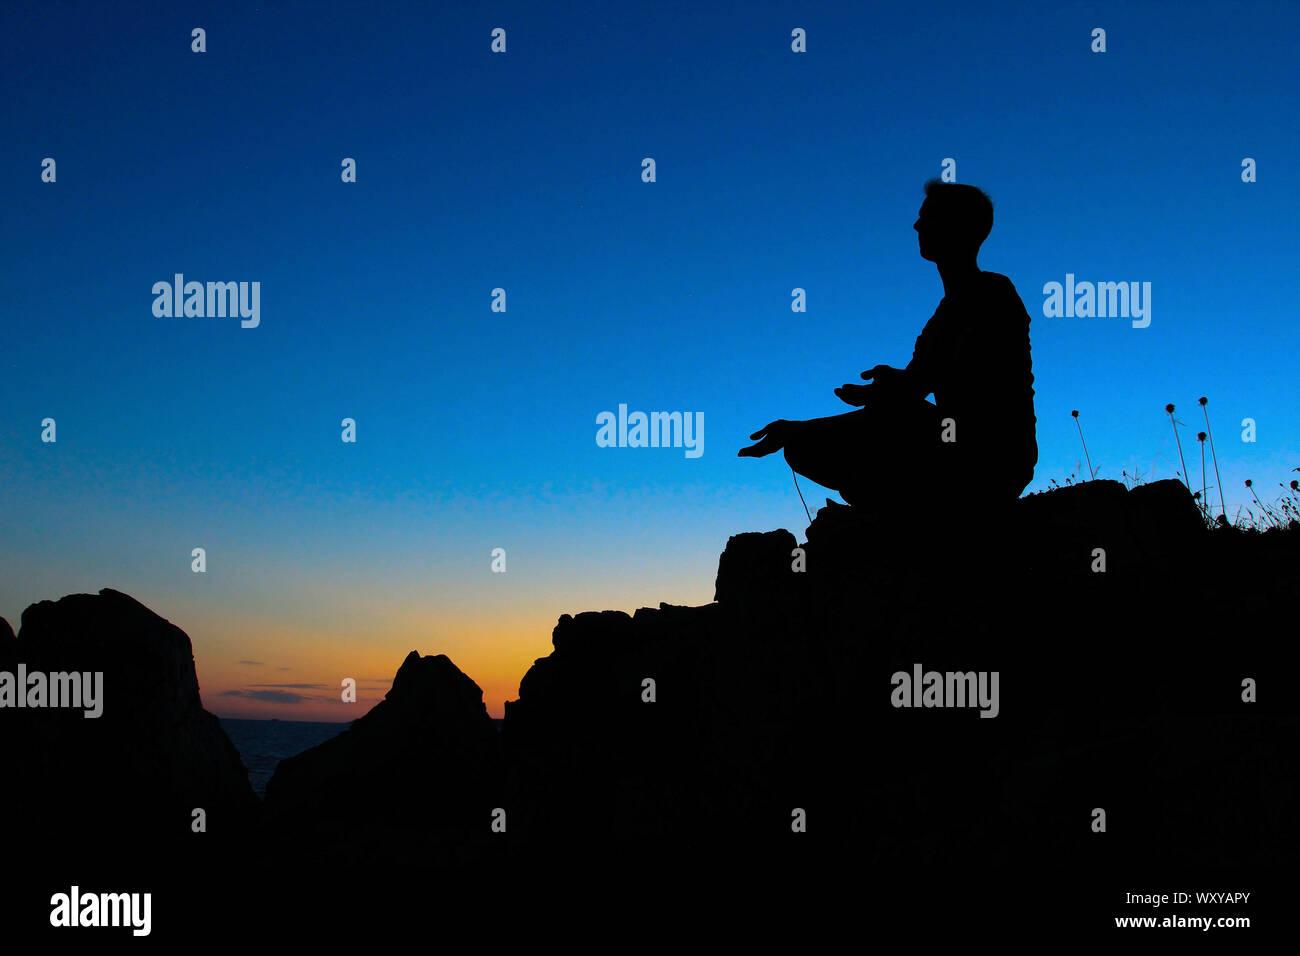 Abenddämmerung Yoga Silhouette Stock Photo